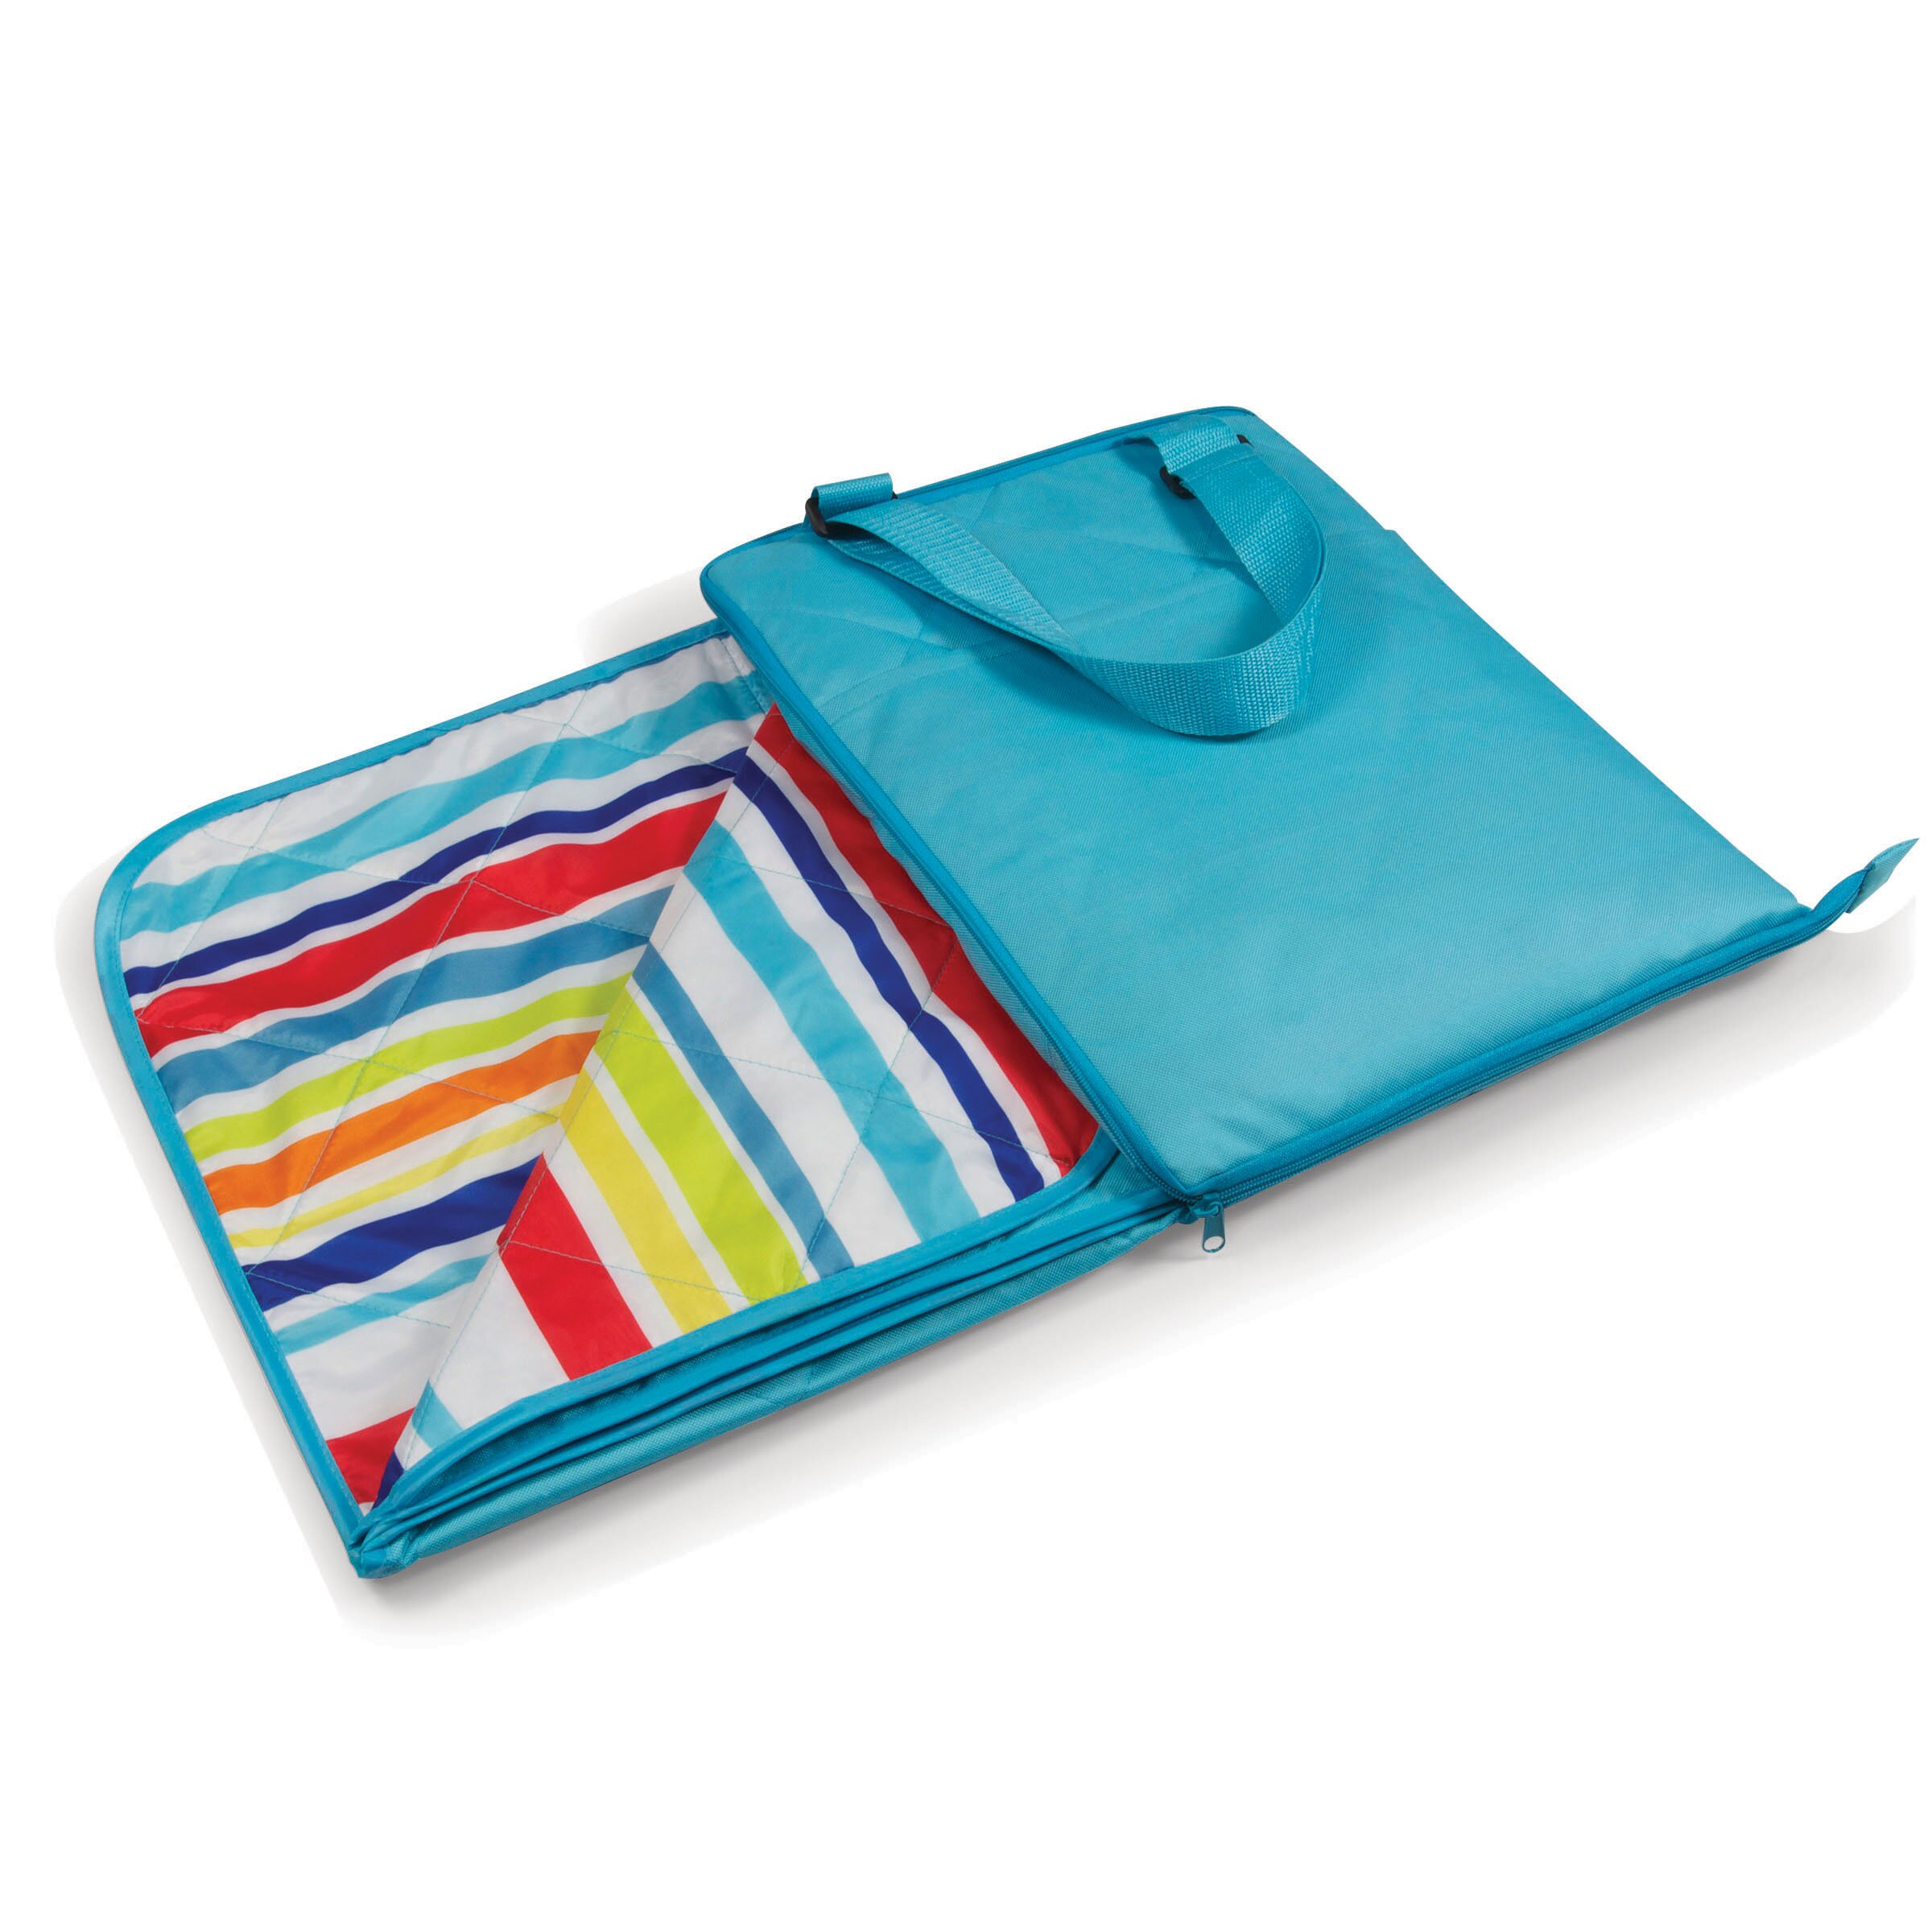 Picnic Time Vista Outdoor Blanket Amp Reviews Wayfair